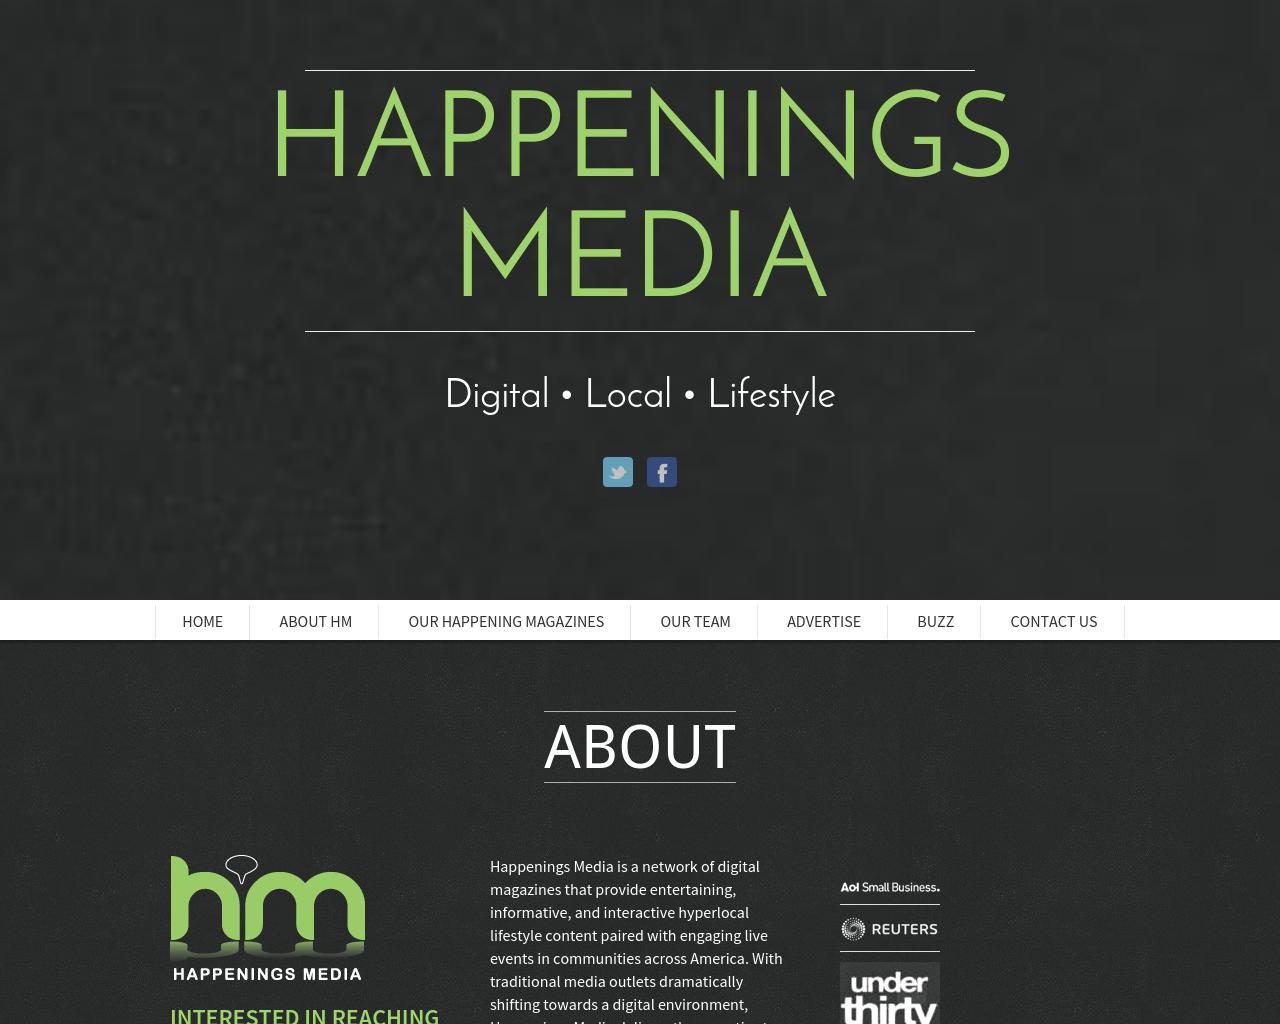 Happenings-Media-Advertising-Reviews-Pricing